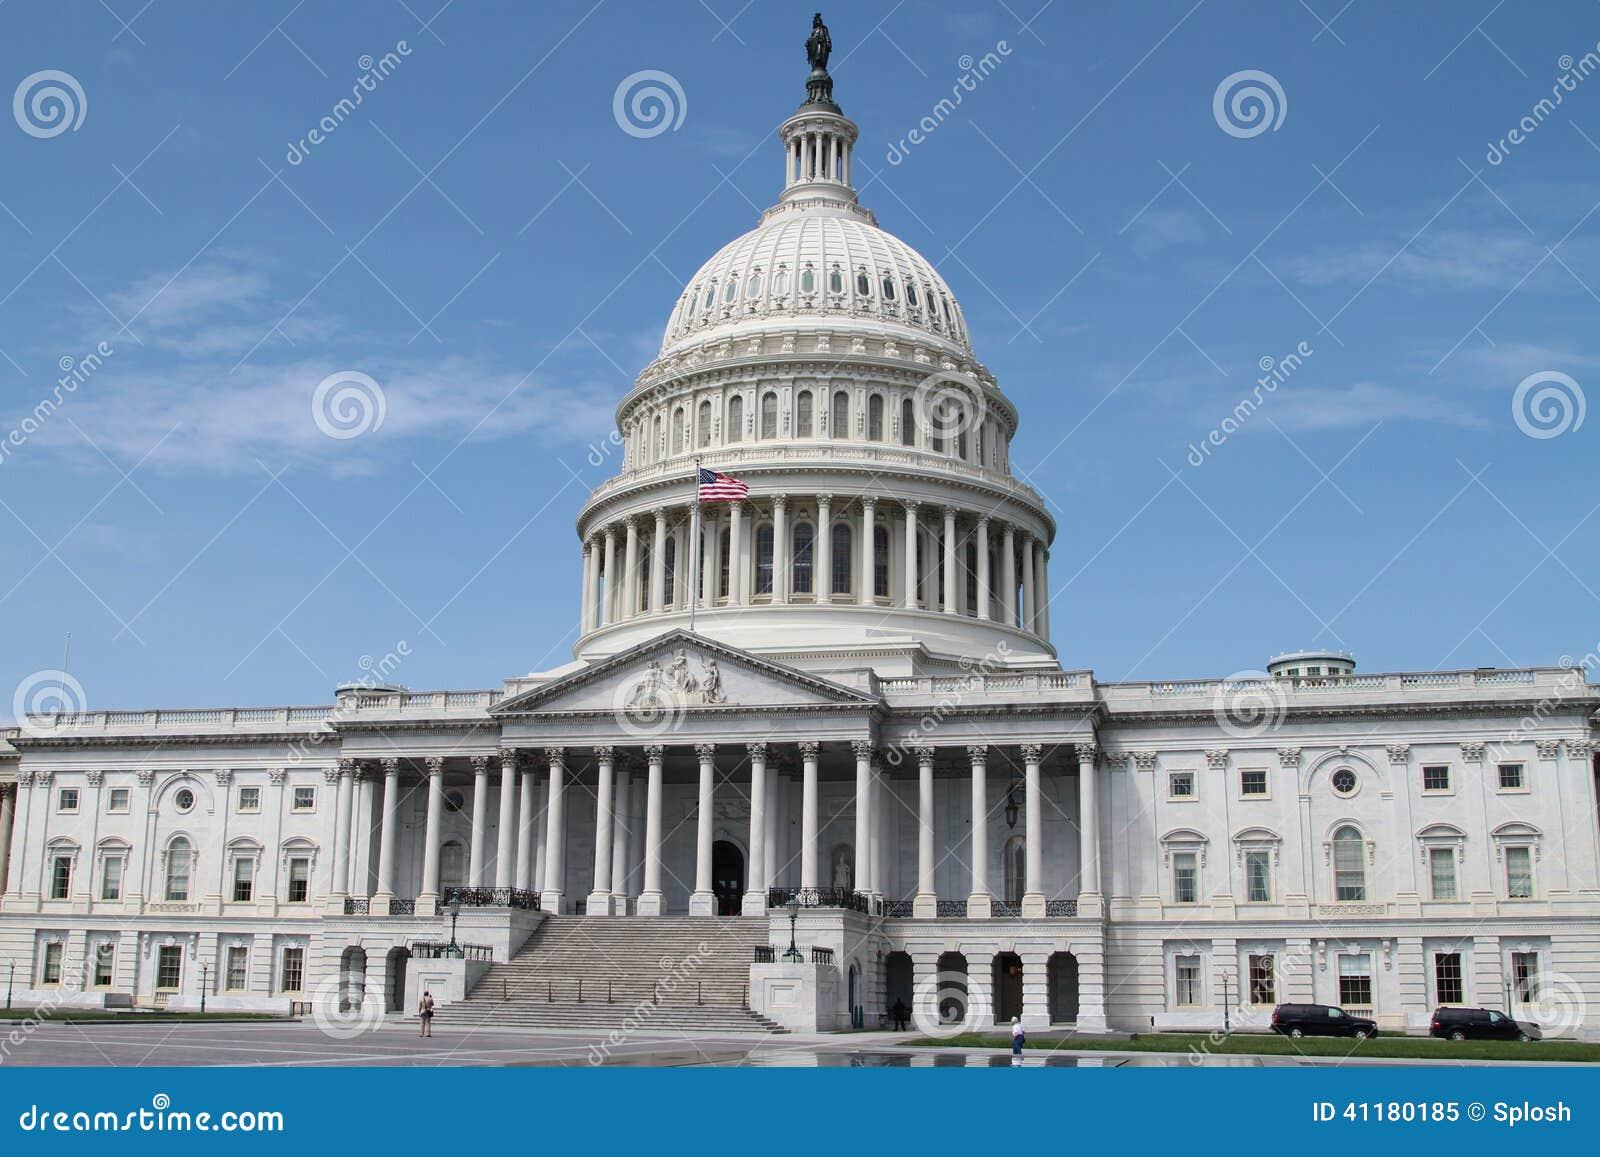 US-Kapitol - Regierungsgebäude